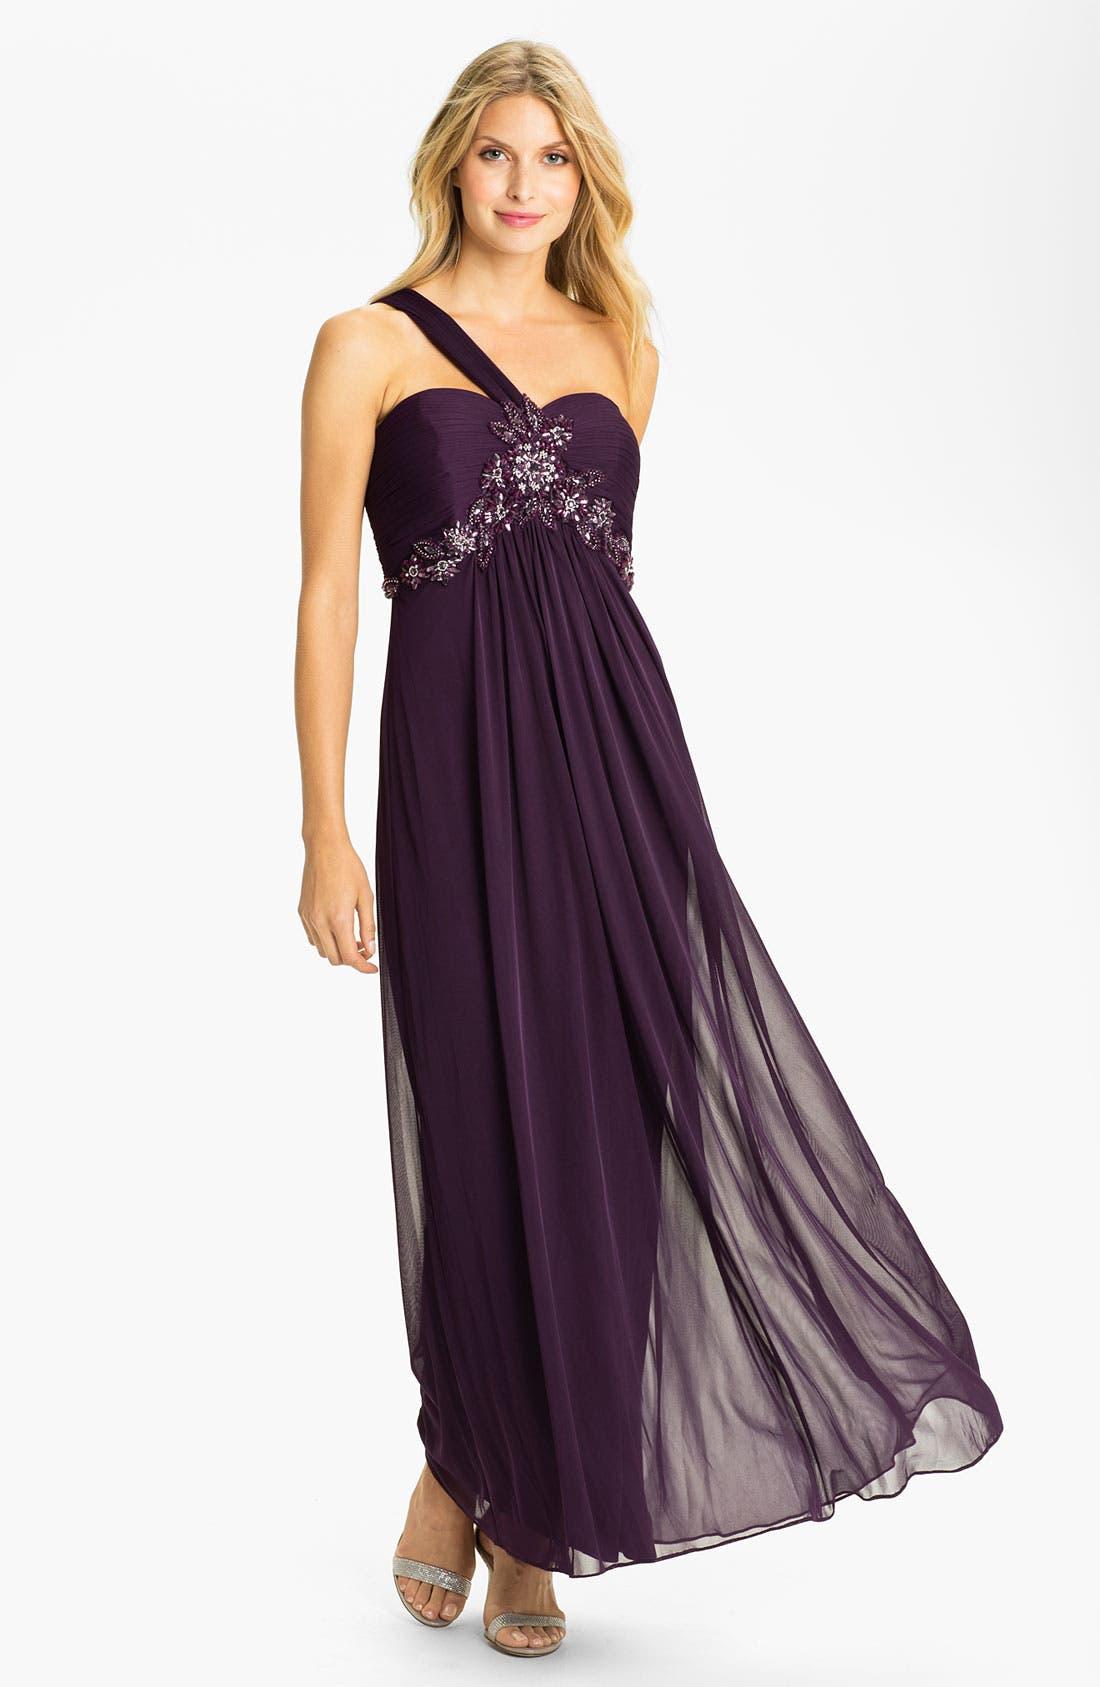 Alternate Image 1 Selected - Xscape One Shoulder Embellished Mesh Gown